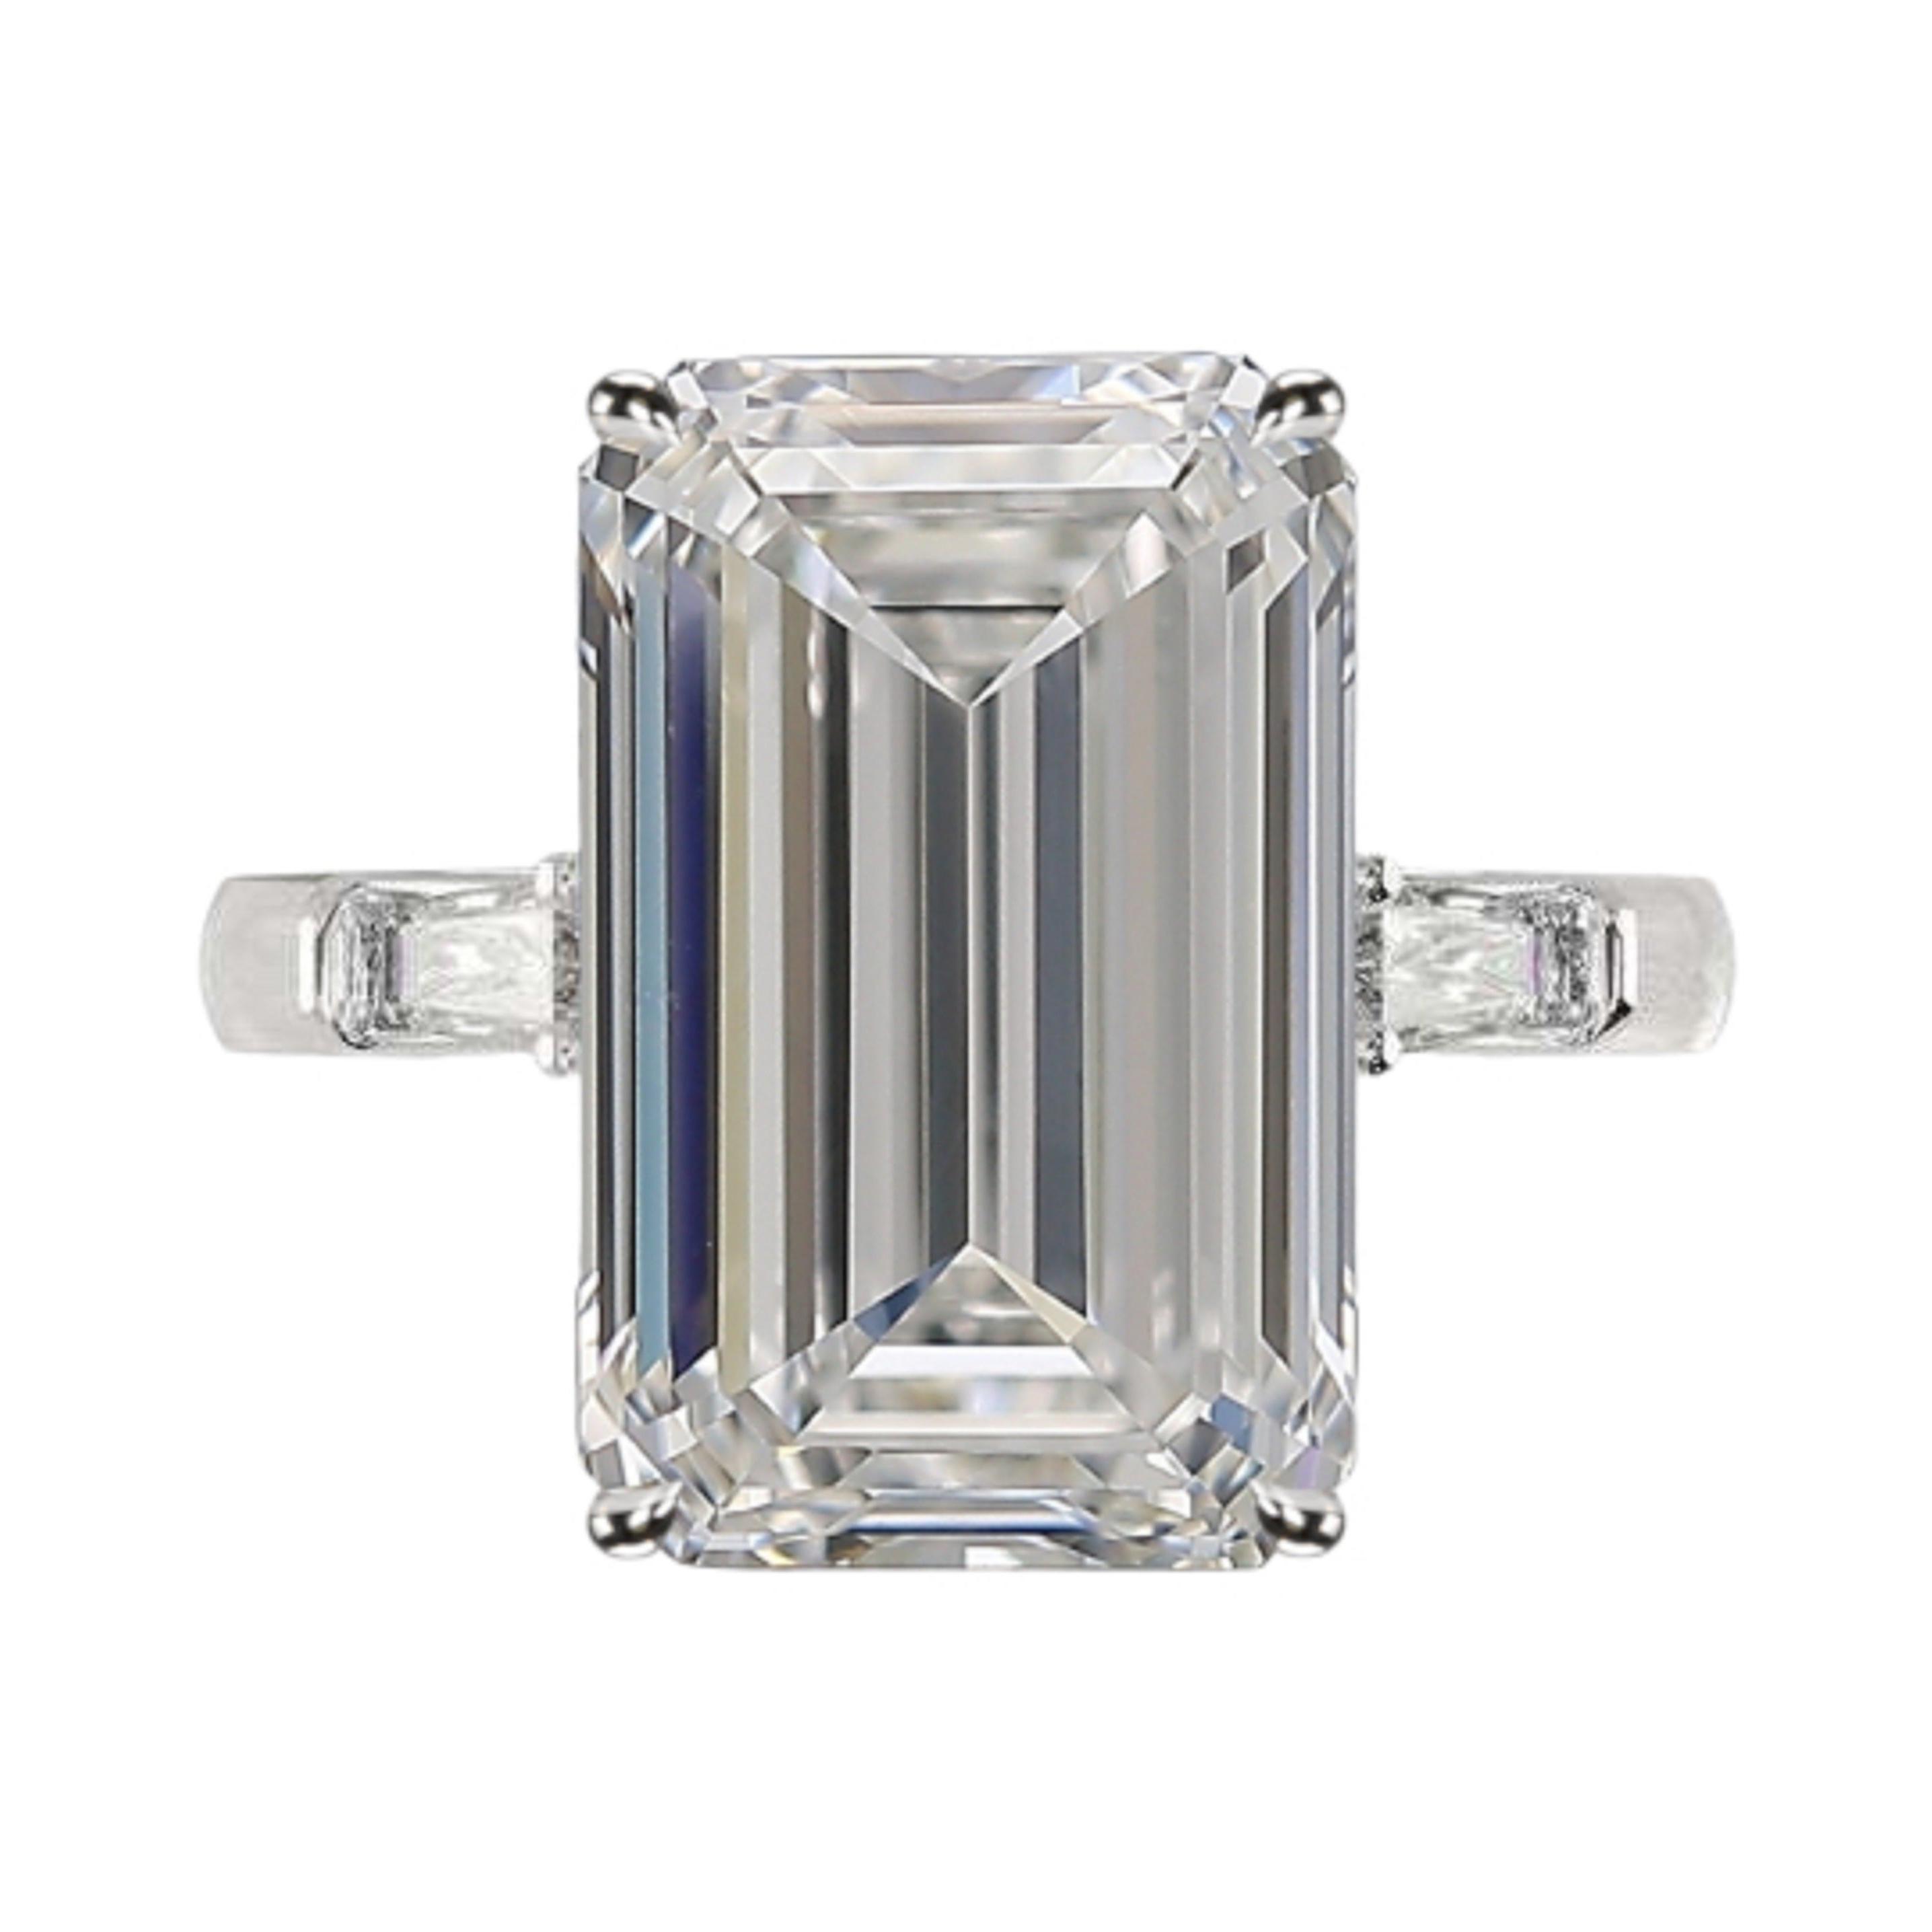 GIA Certified 5.50 Carat Long Emerald Cut Diamond Platinum Ring